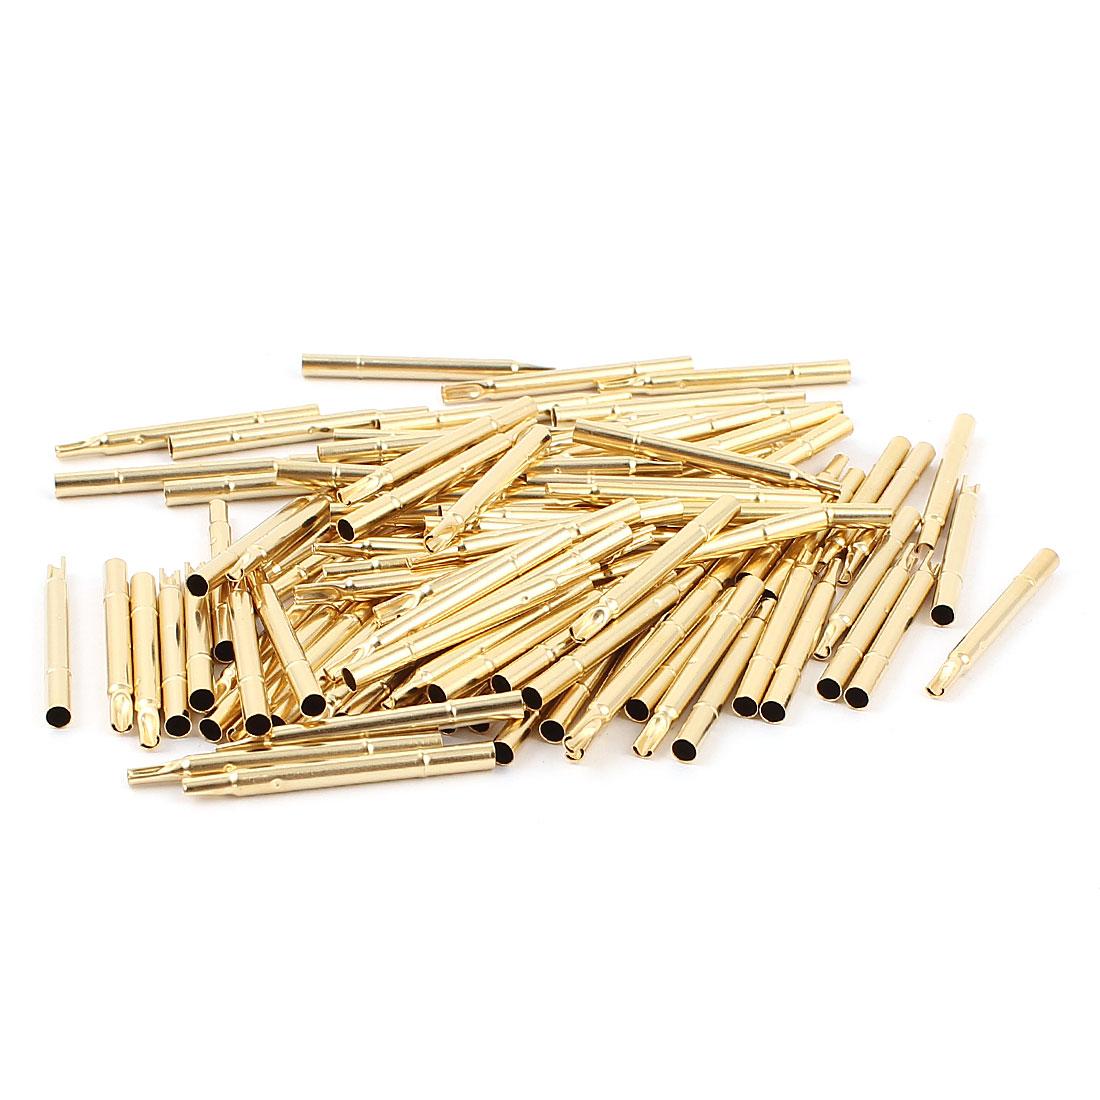 100 Pcs R156-4S 2.69mm Dia Testing Probe Pin Receptacles Gold Tone